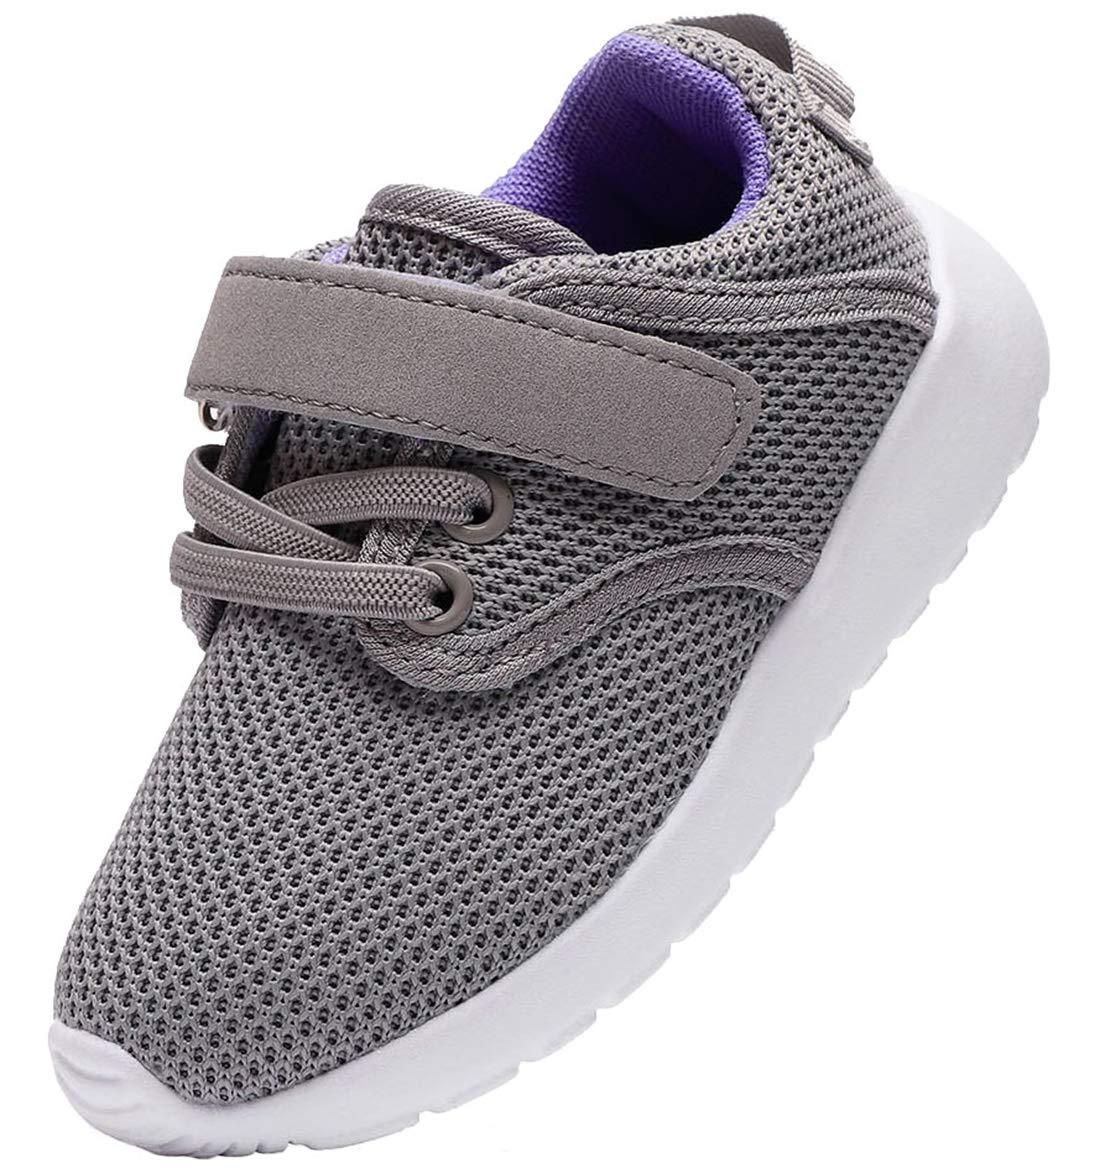 PPXID Boy's Girl's Breathable Mesh Hoop Loop Casual Sneaker Running Shoes-Gray 8.5 US Toddler